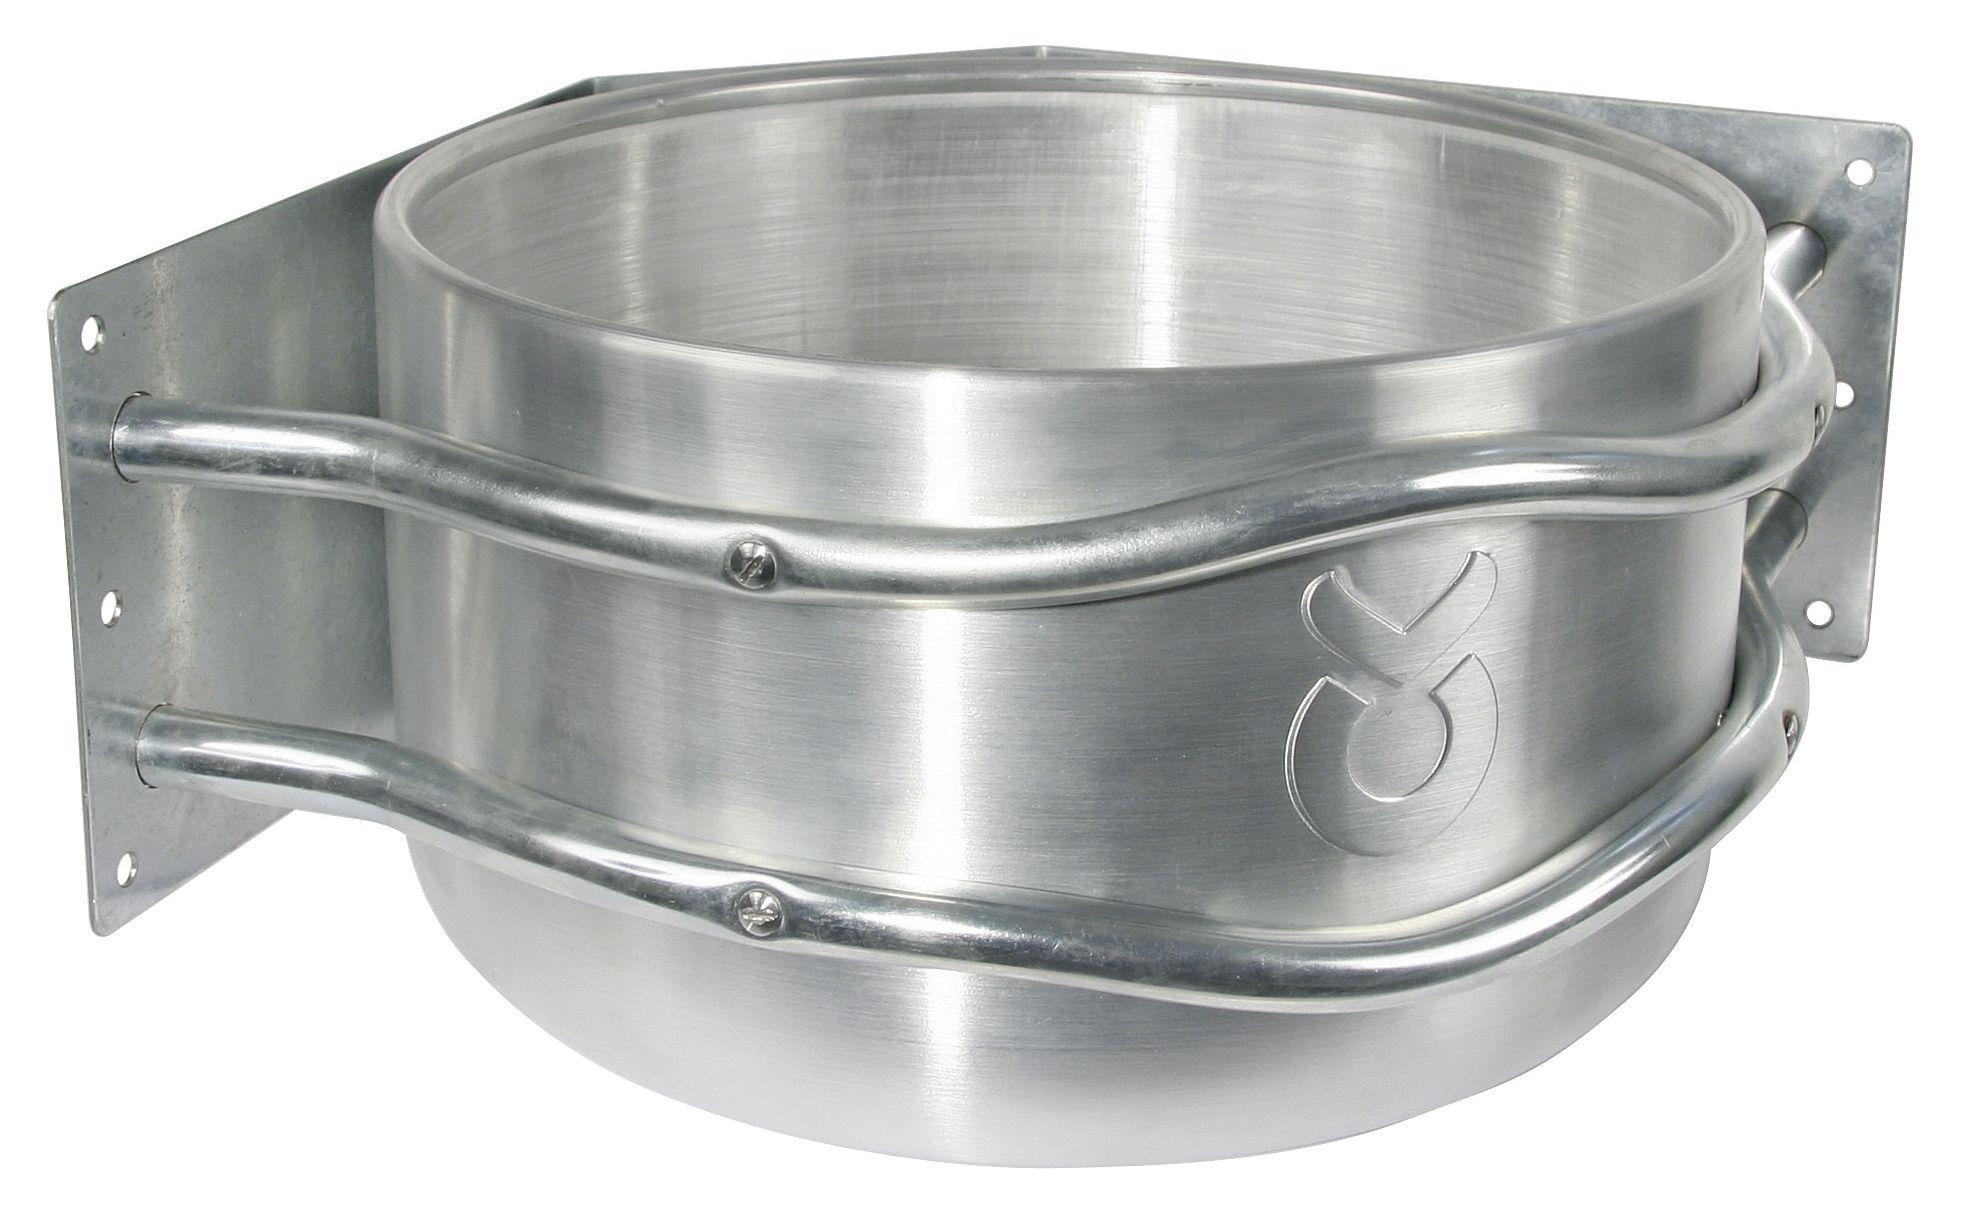 Futtertrog Aluminium, ca. 18l, zur Eckmontage, mit Ablauf